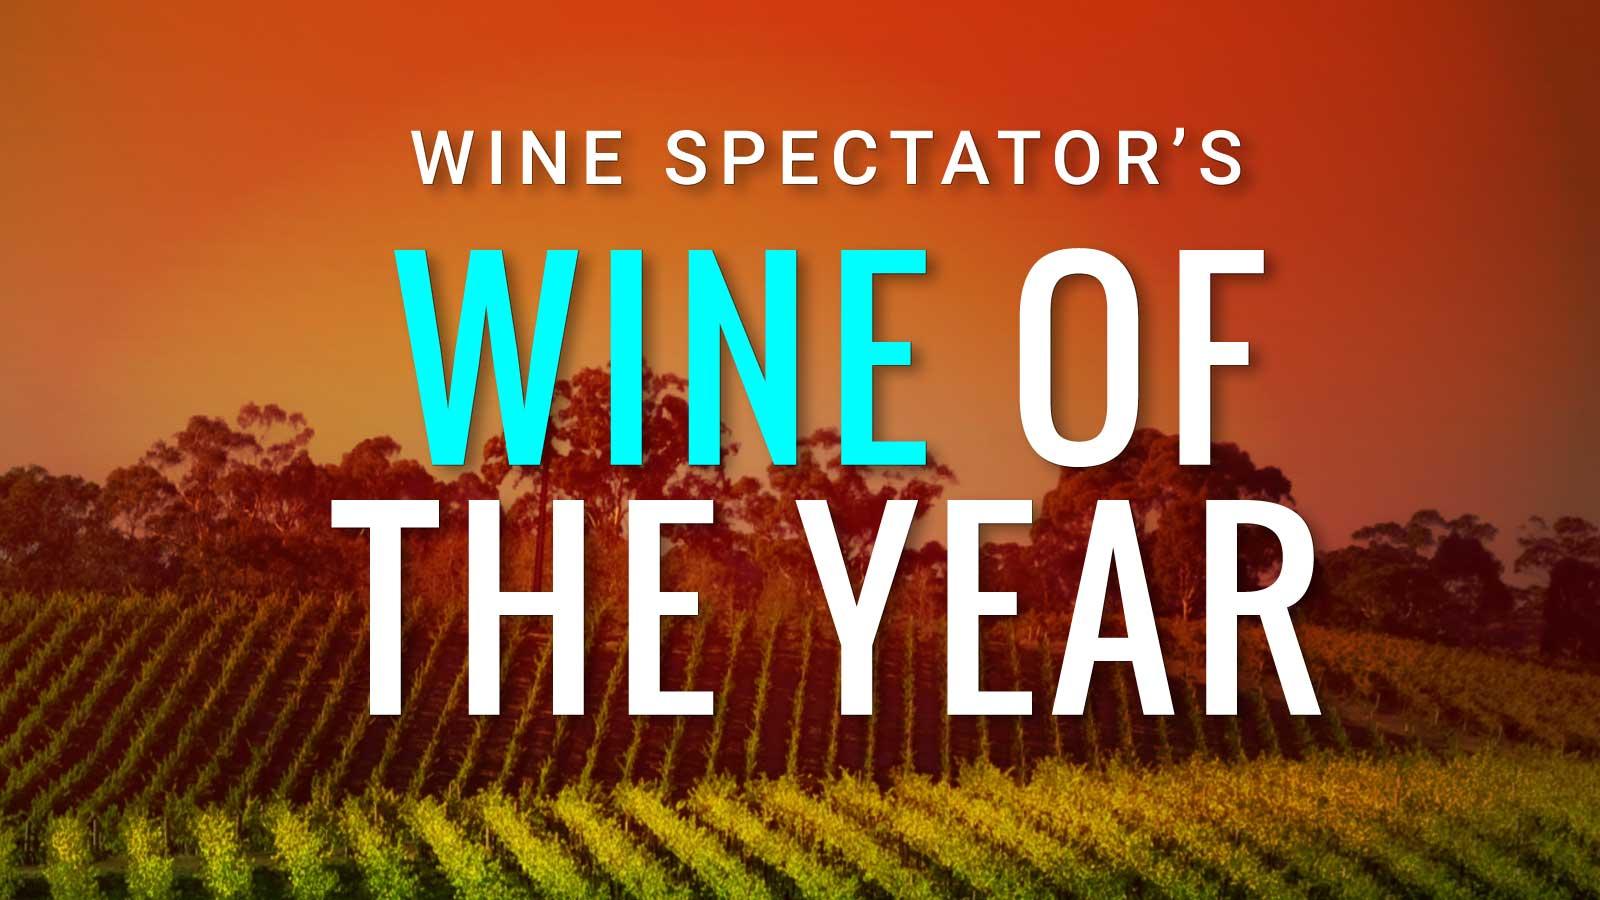 Wine Refrigerator Reviews Wine Spectator wine spectator announces its 2015 wine of the year | news | news